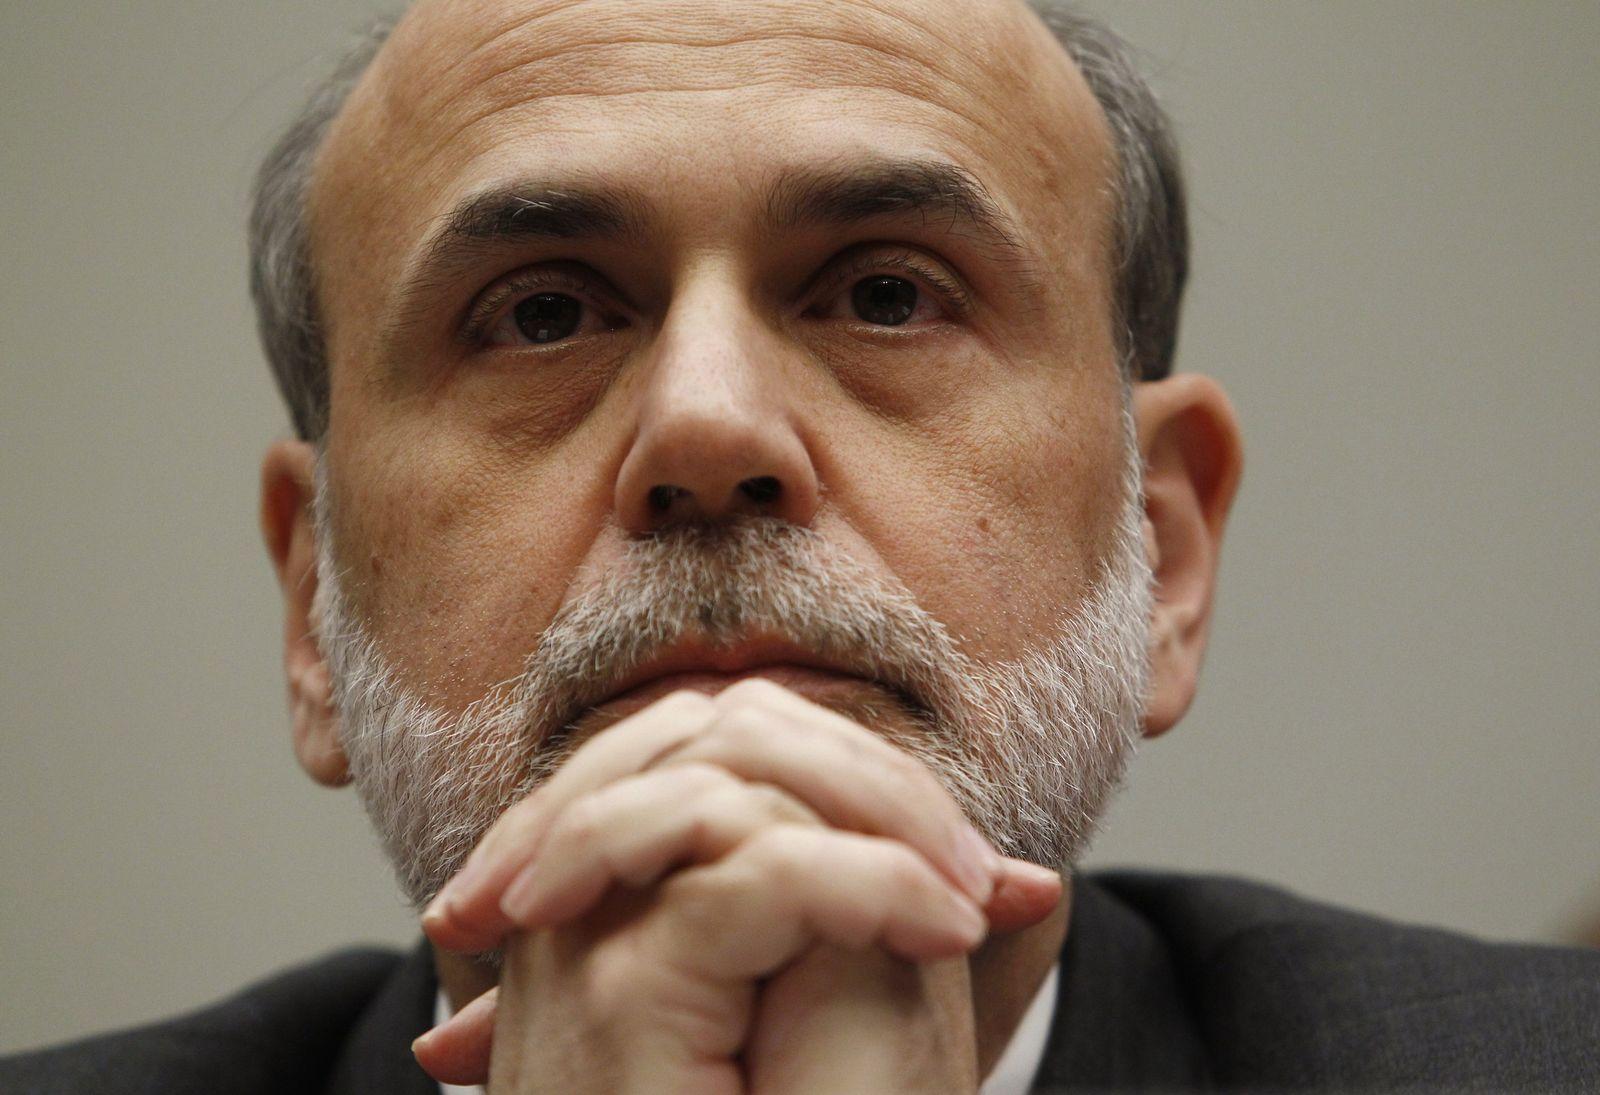 Fed / Ben Bernanke